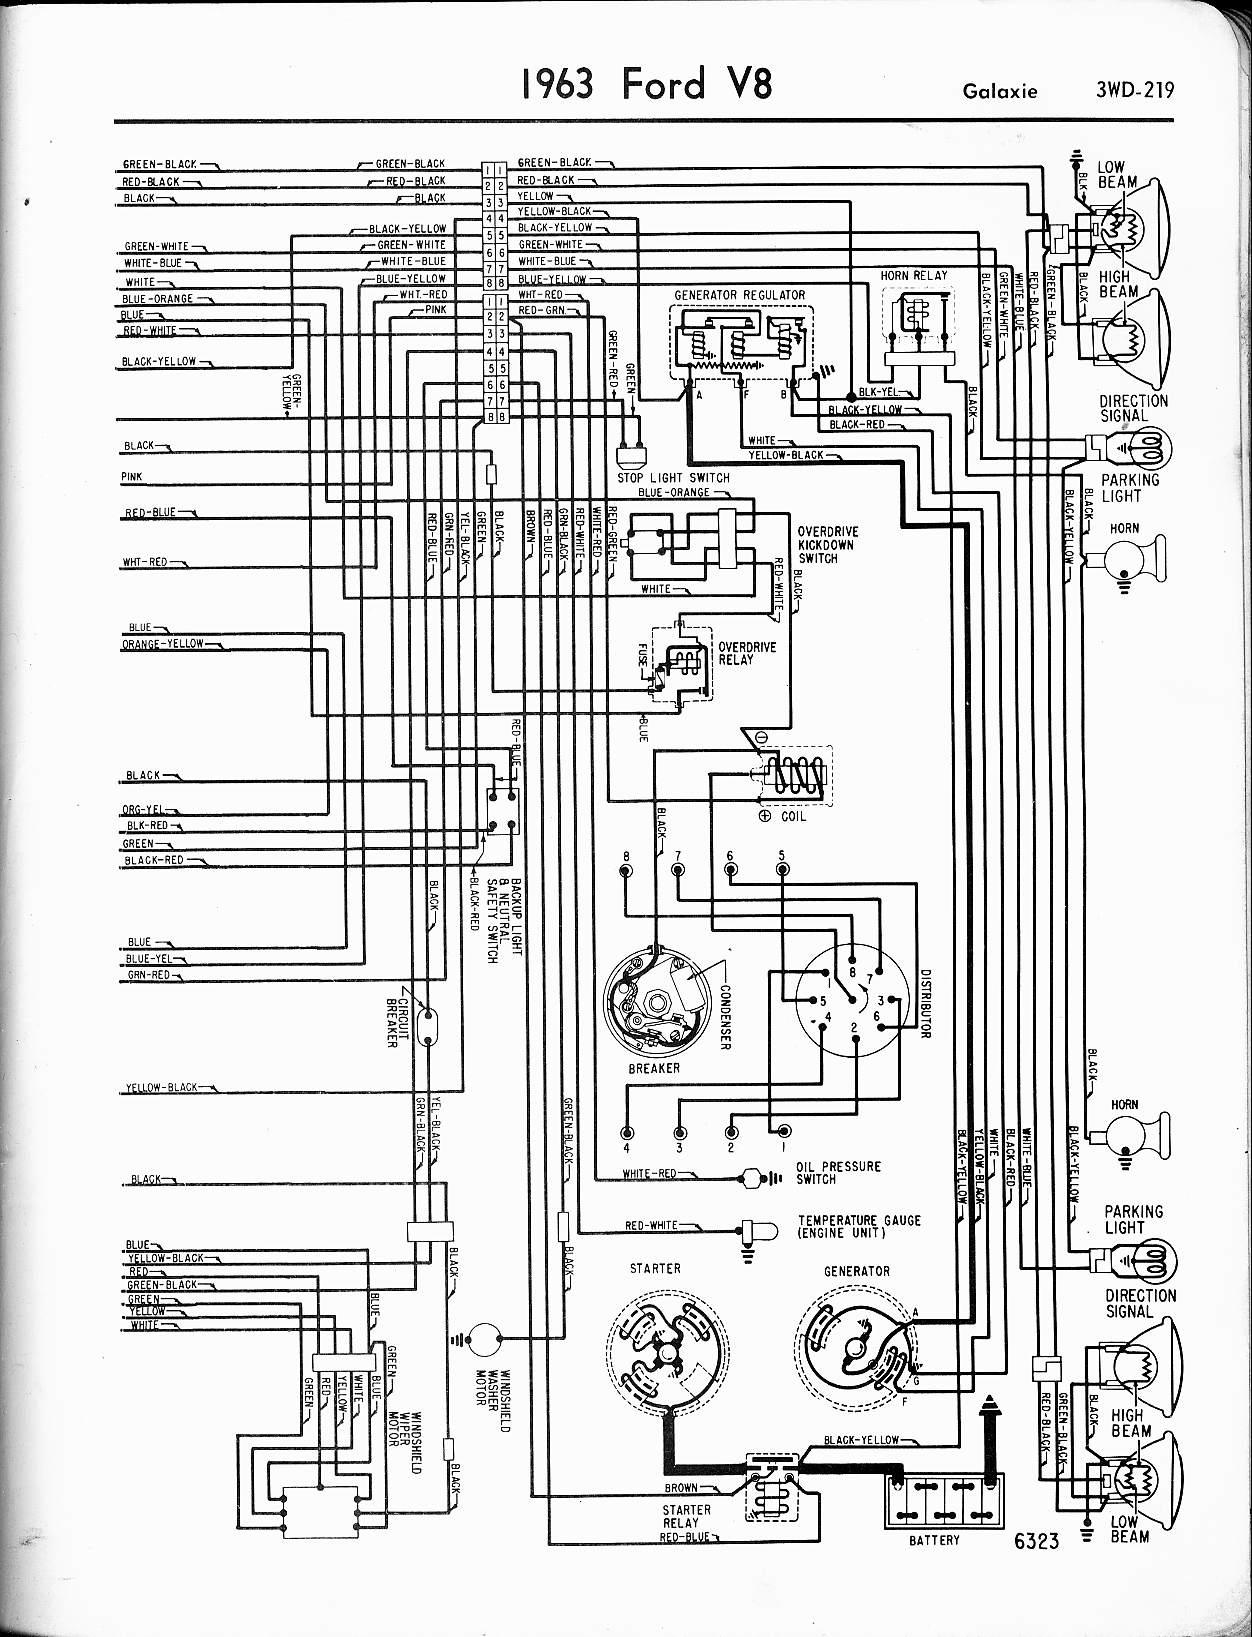 2001 Duramax Wiring Diagram Library Images For Ford Galaxy Desktophddesignwall3d Ga Get Free High